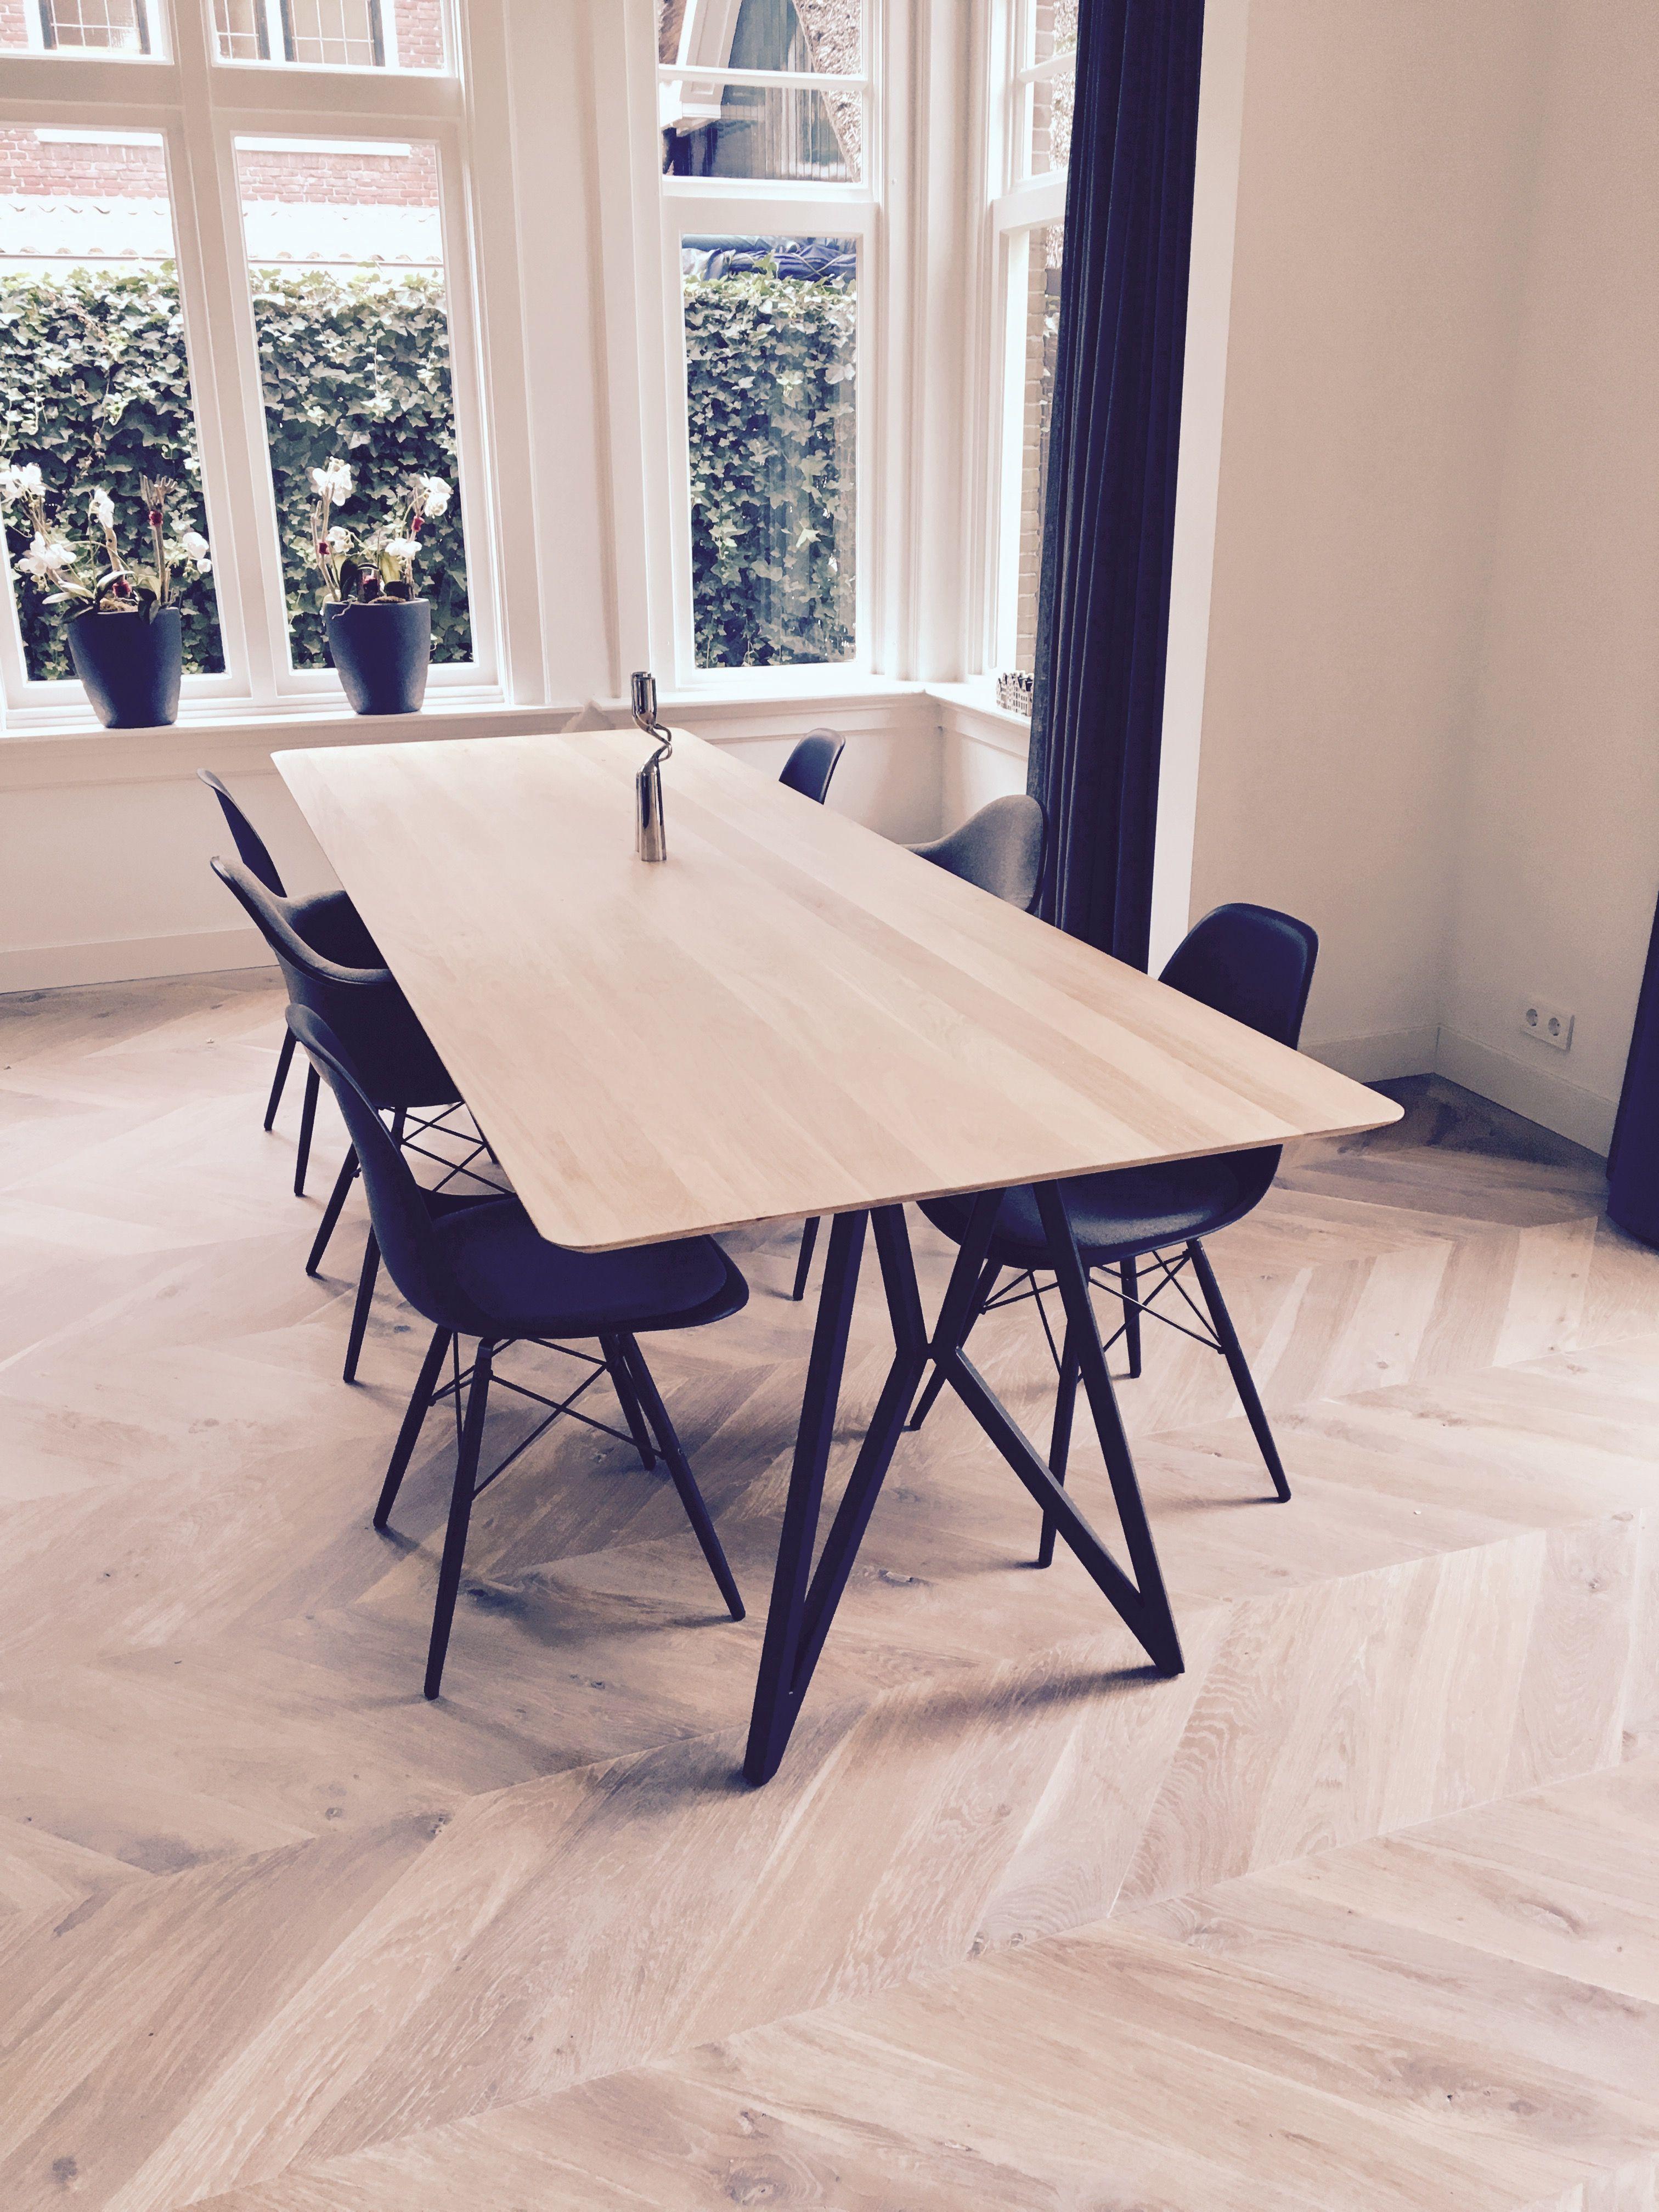 Studio H&K | Design Eettafel Butterfly Wandkasten Krukken ...